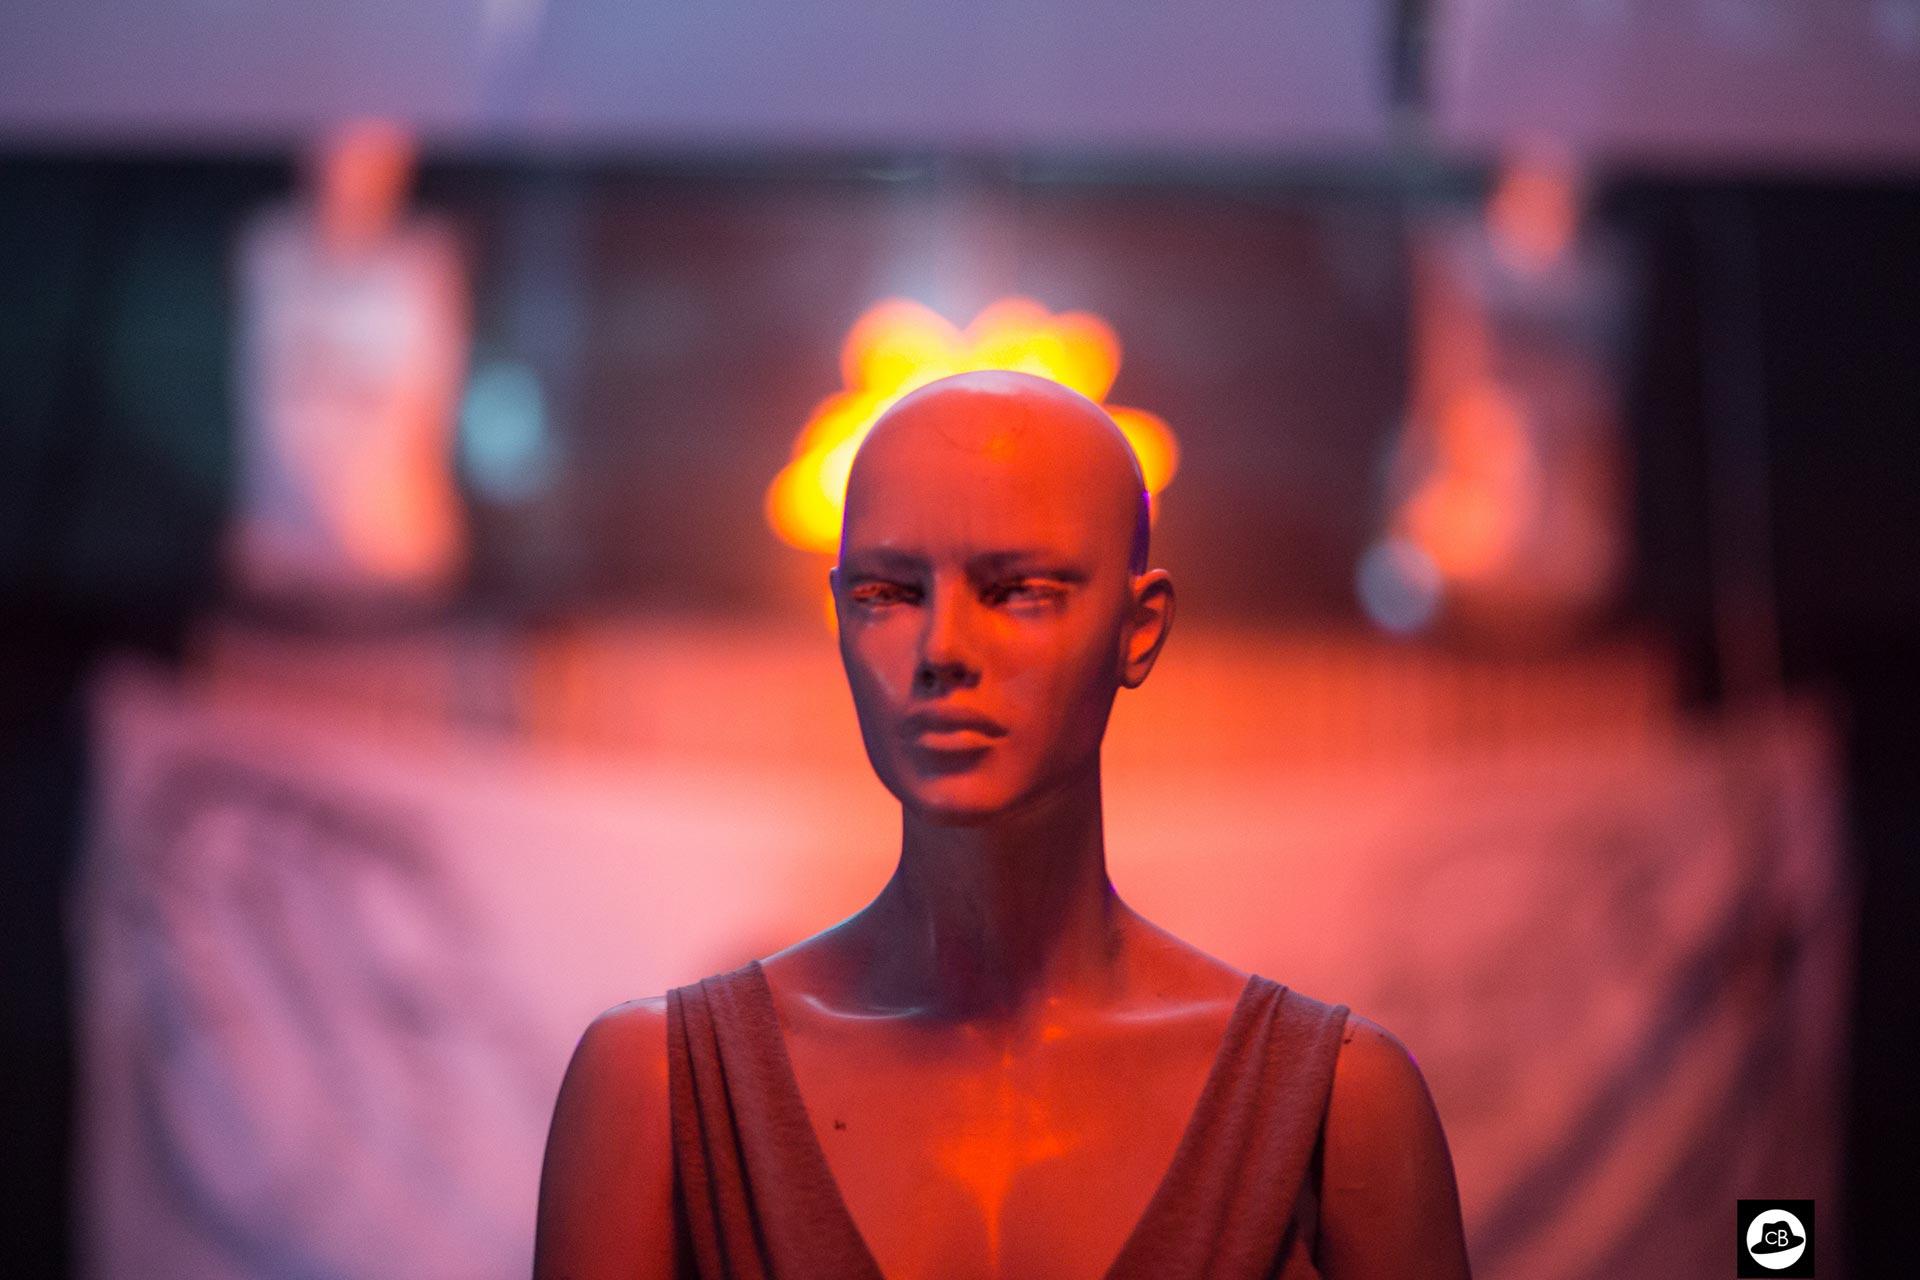 Vbank charming plastic mannequin